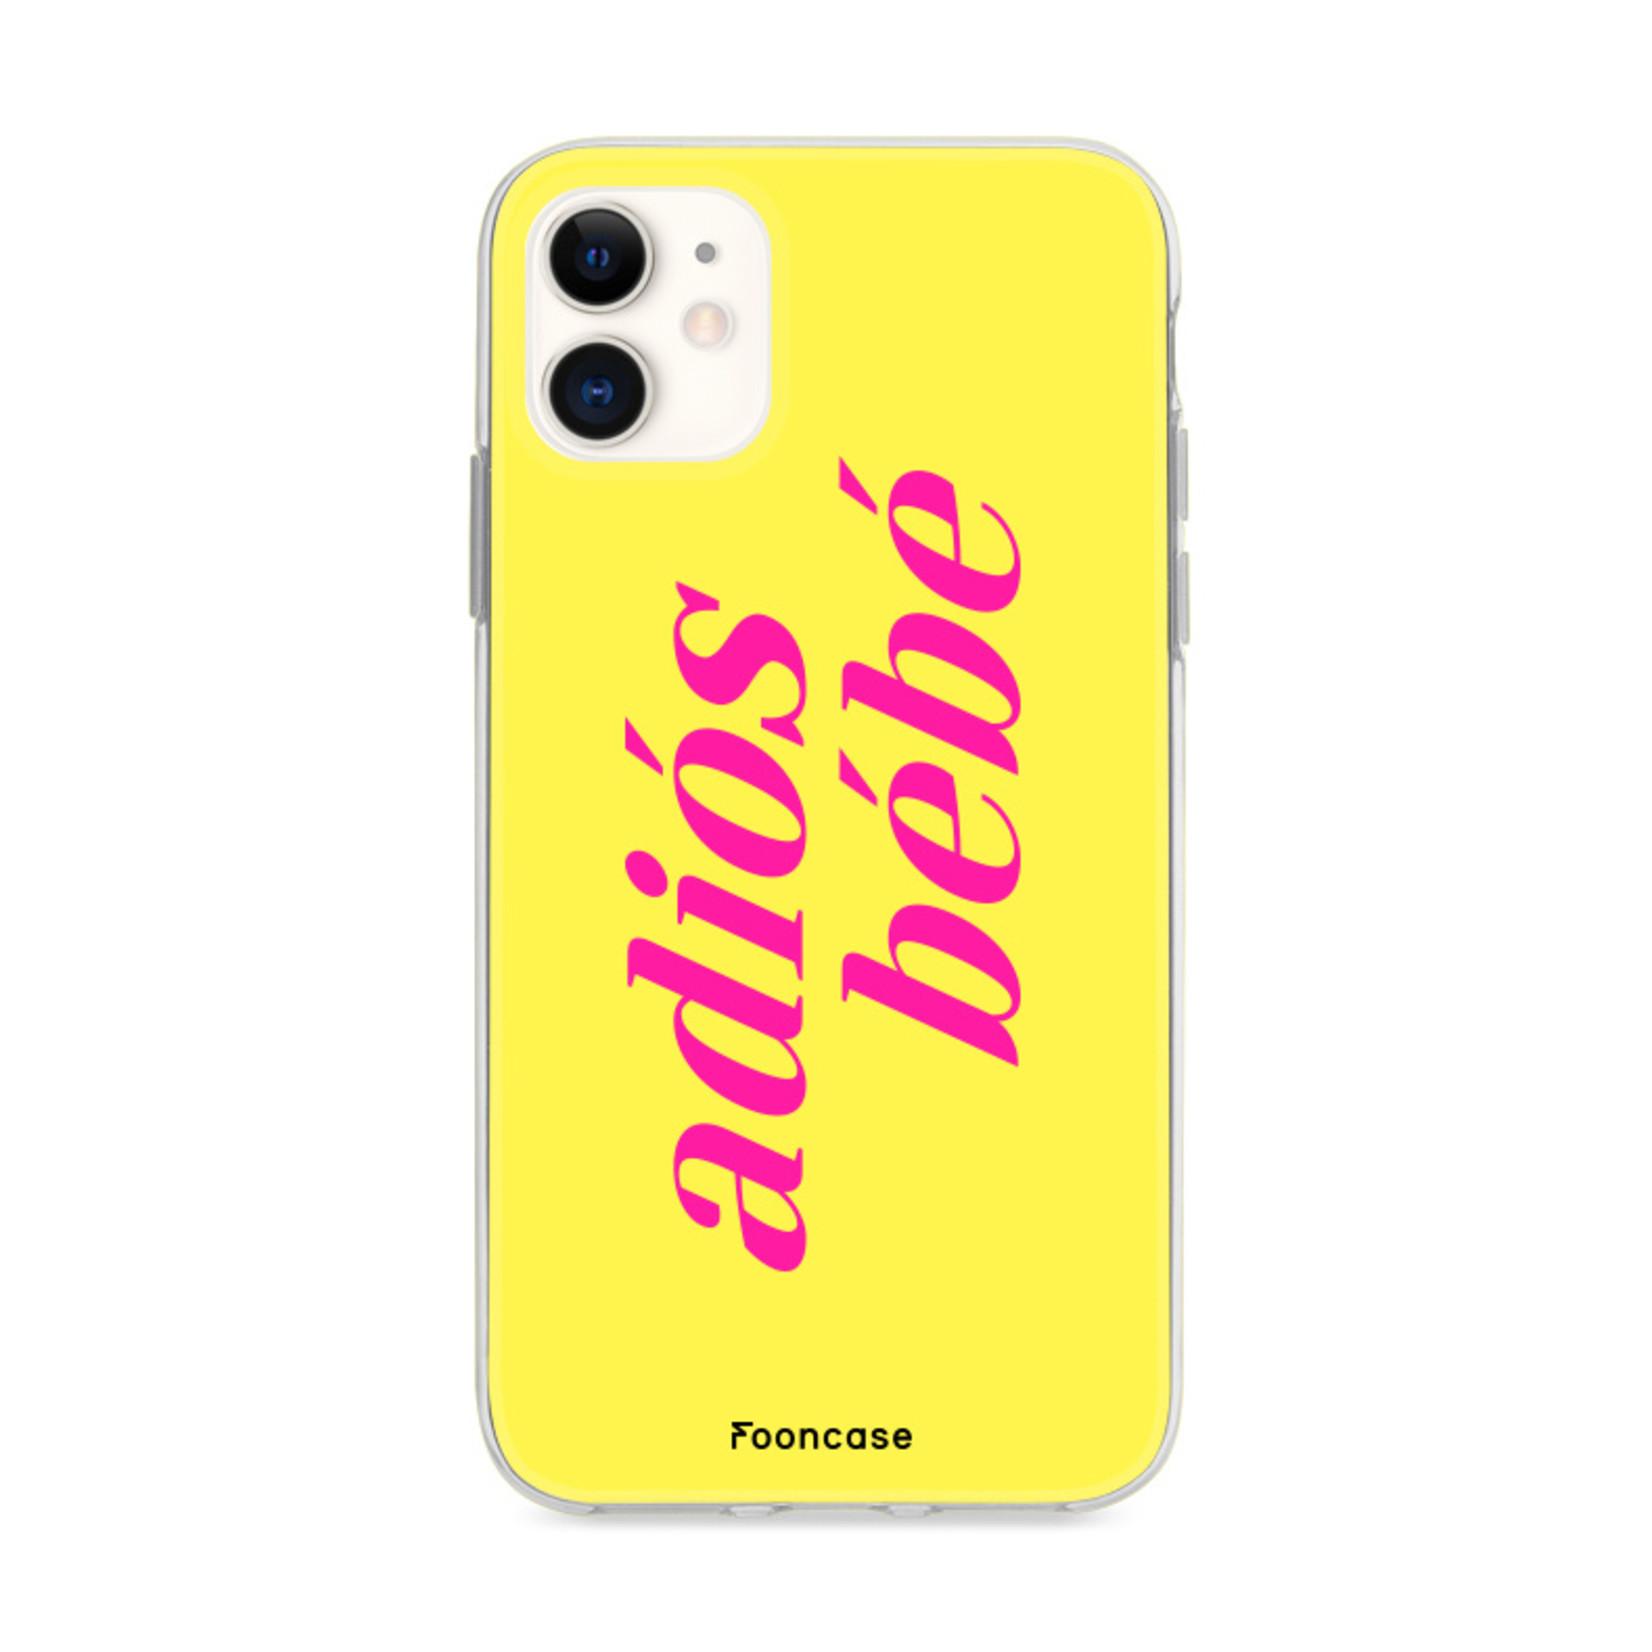 FOONCASE iPhone 12 Mini hoesje TPU Soft Case - Back Cover - Adiós Bébé ☀  / Geel & Roze